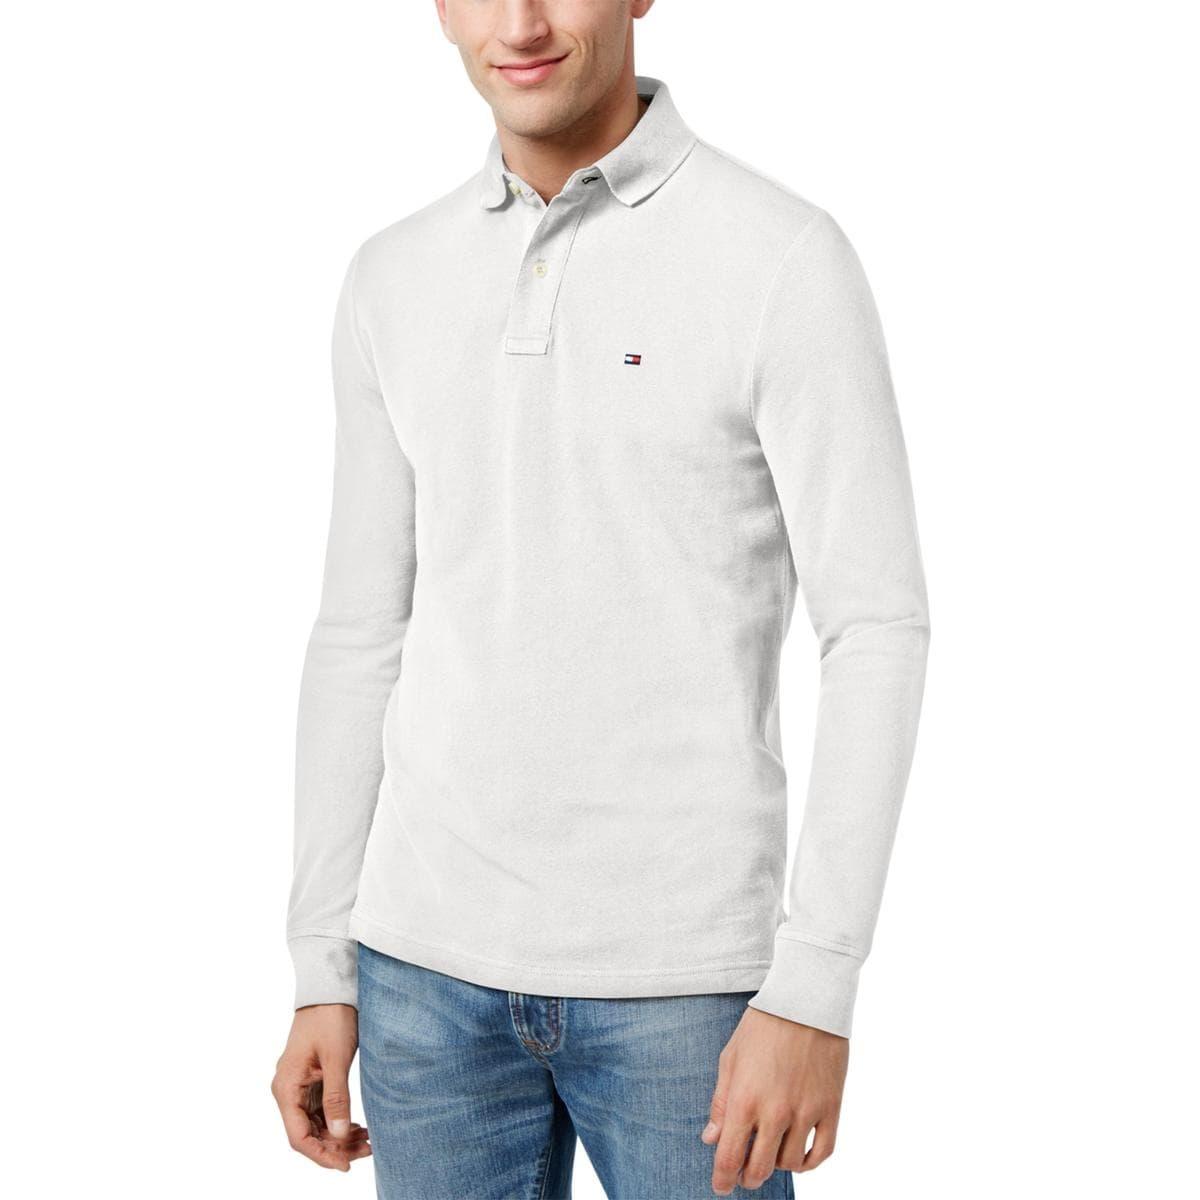 68534840389 Mens Long Sleeve Polo Shirts Near Me